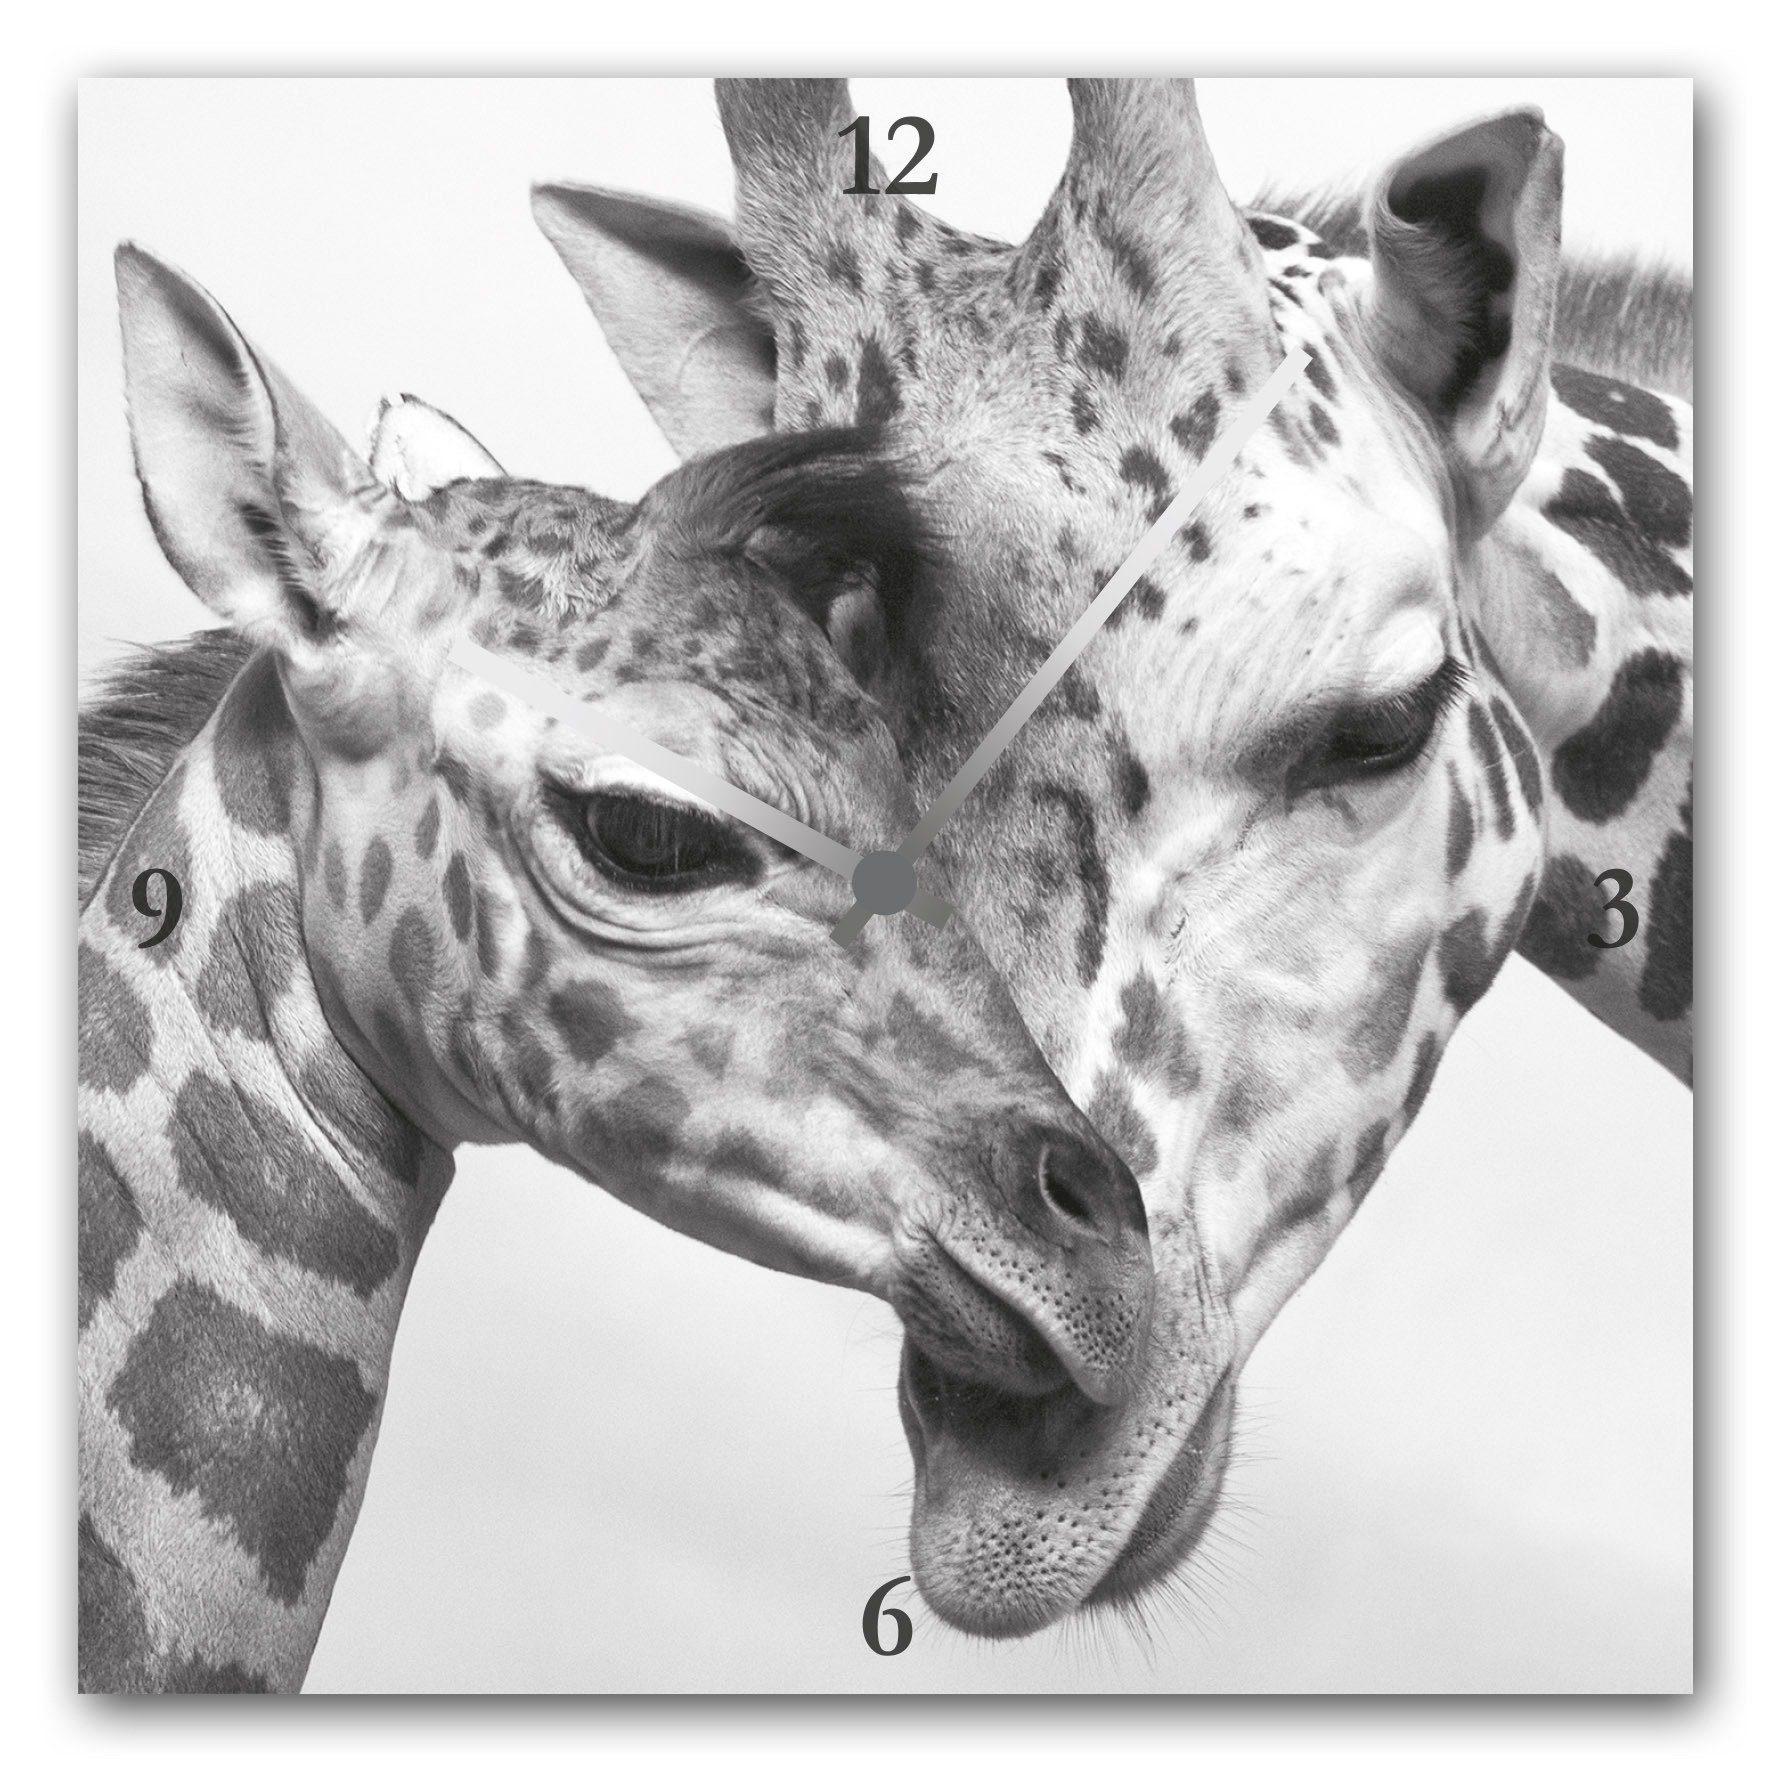 Acrylglas-Uhr »Giraffen«